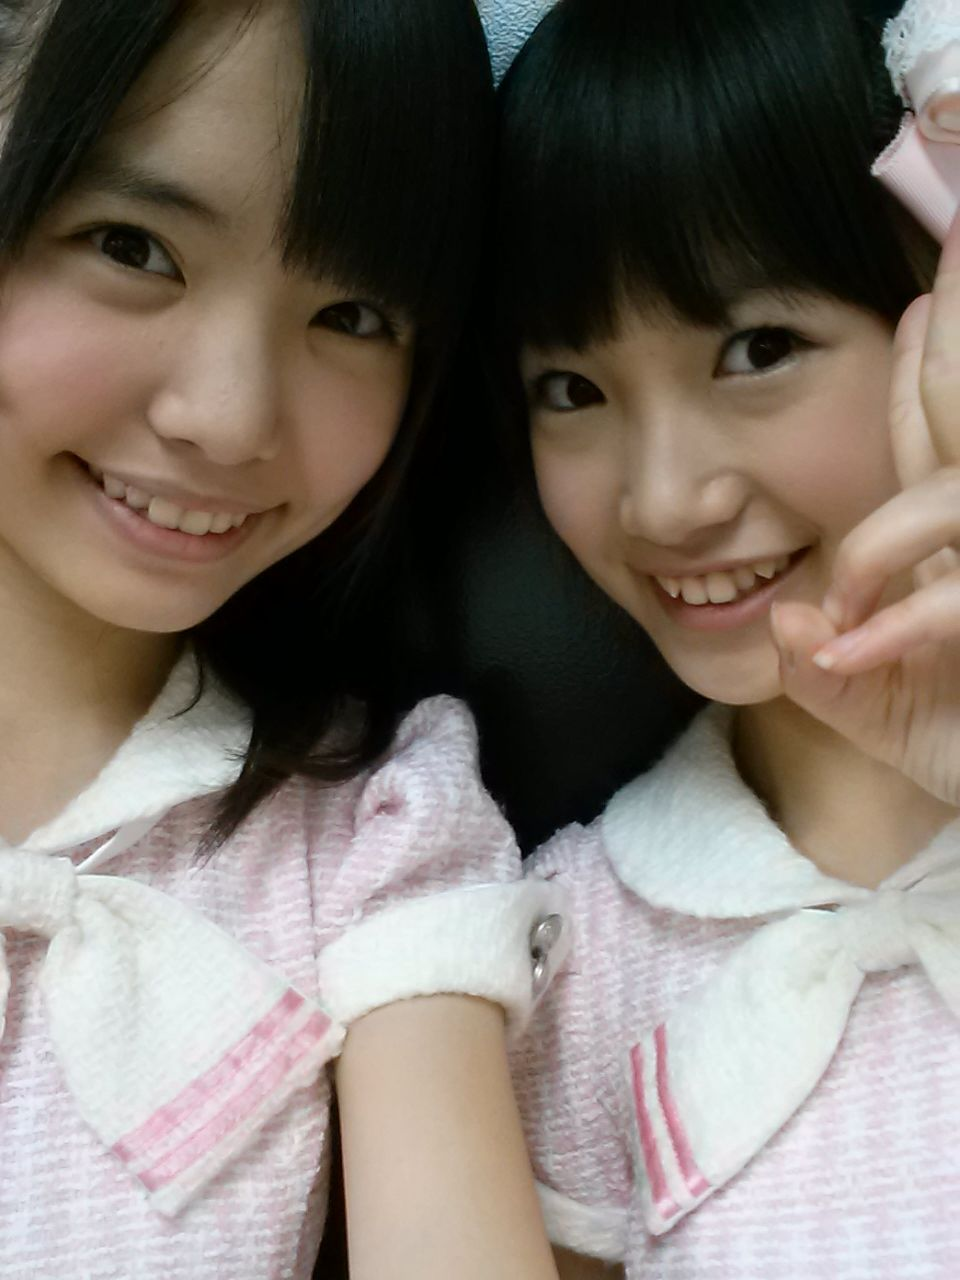 http://livedoor.blogimg.jp/otohaeika/imgs/9/2/92cdb106.jpg